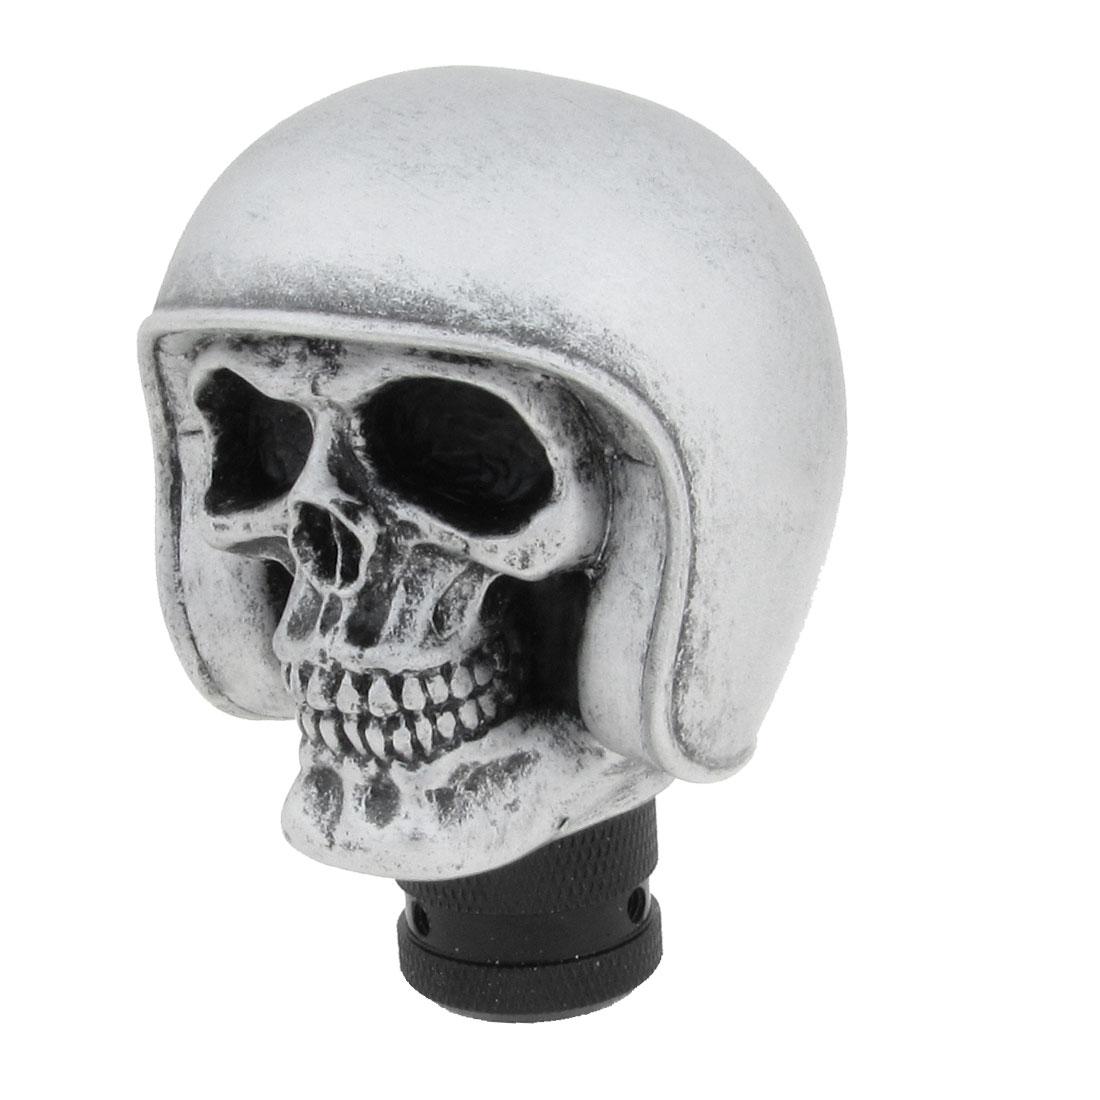 Automobile Car Silver Gray Hat Manual Skull Shape Head Gear Shift Knob